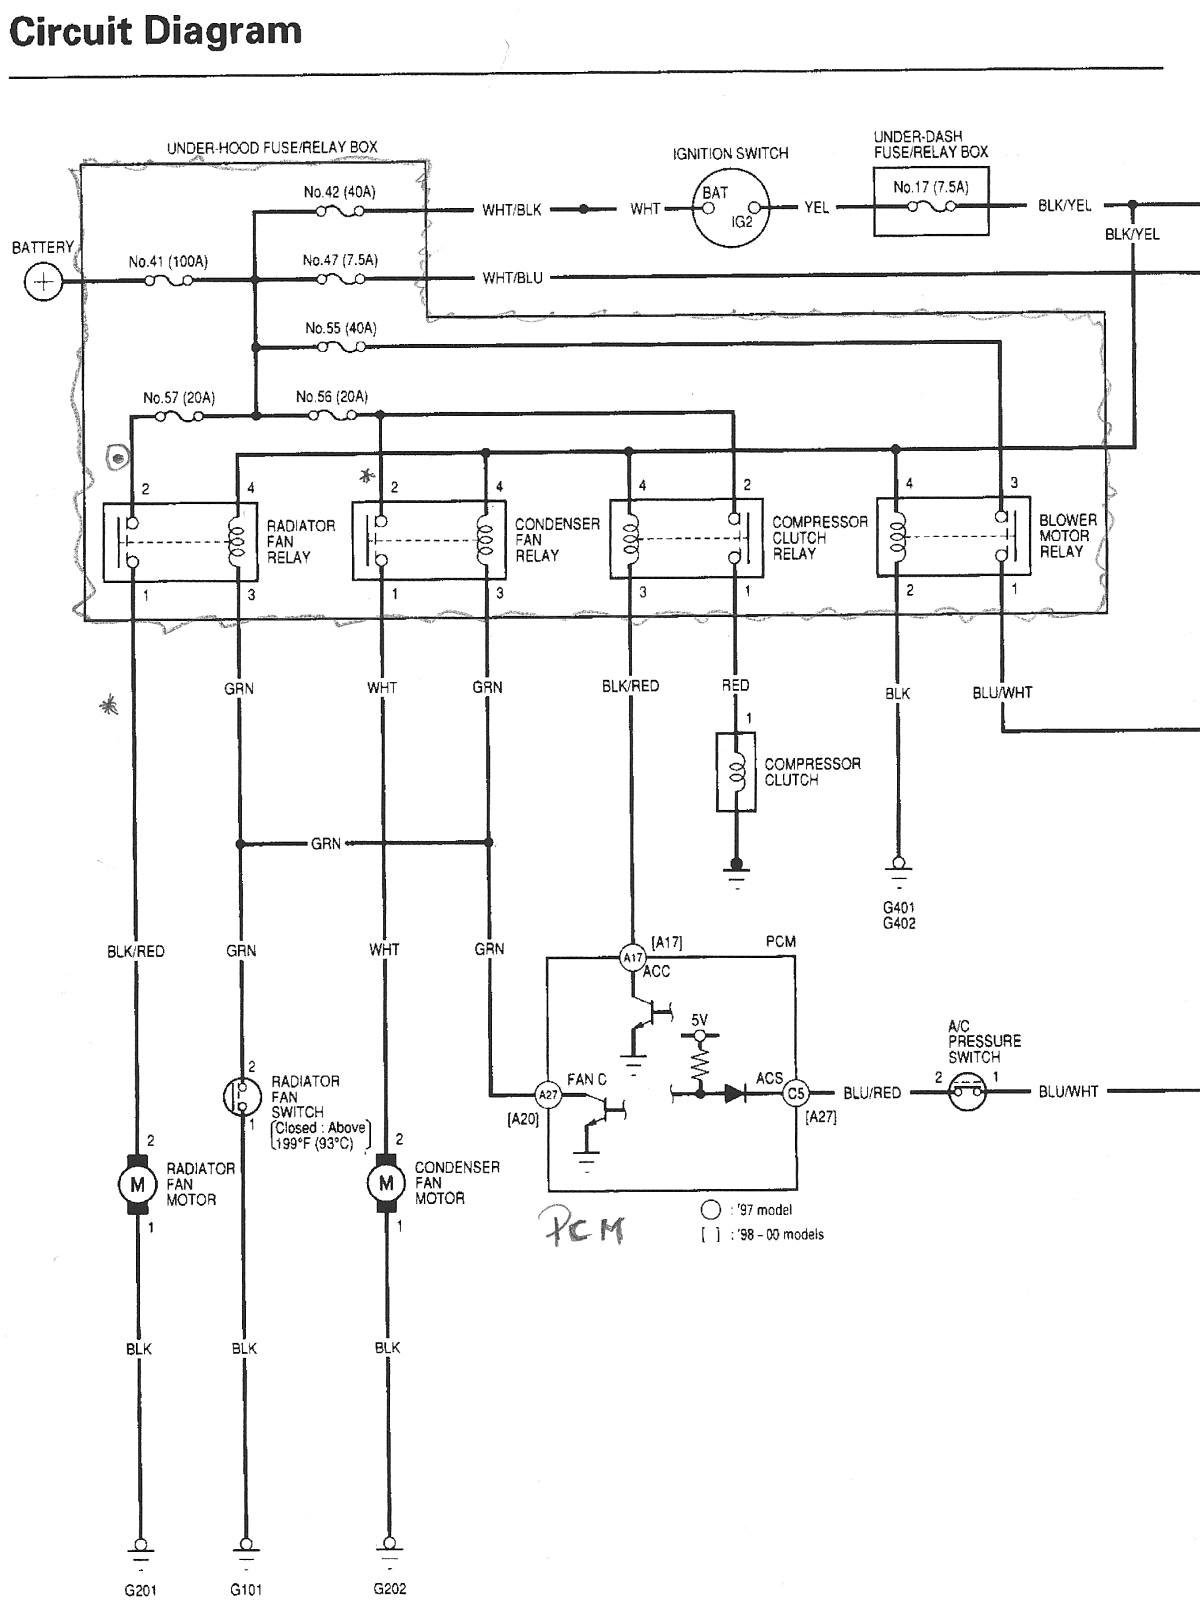 2000 Civic Engine Diagram 2000 Honda Accord Engine Diagram 2003 Honda Accord Stereo Wiring Of 2000 Civic Engine Diagram